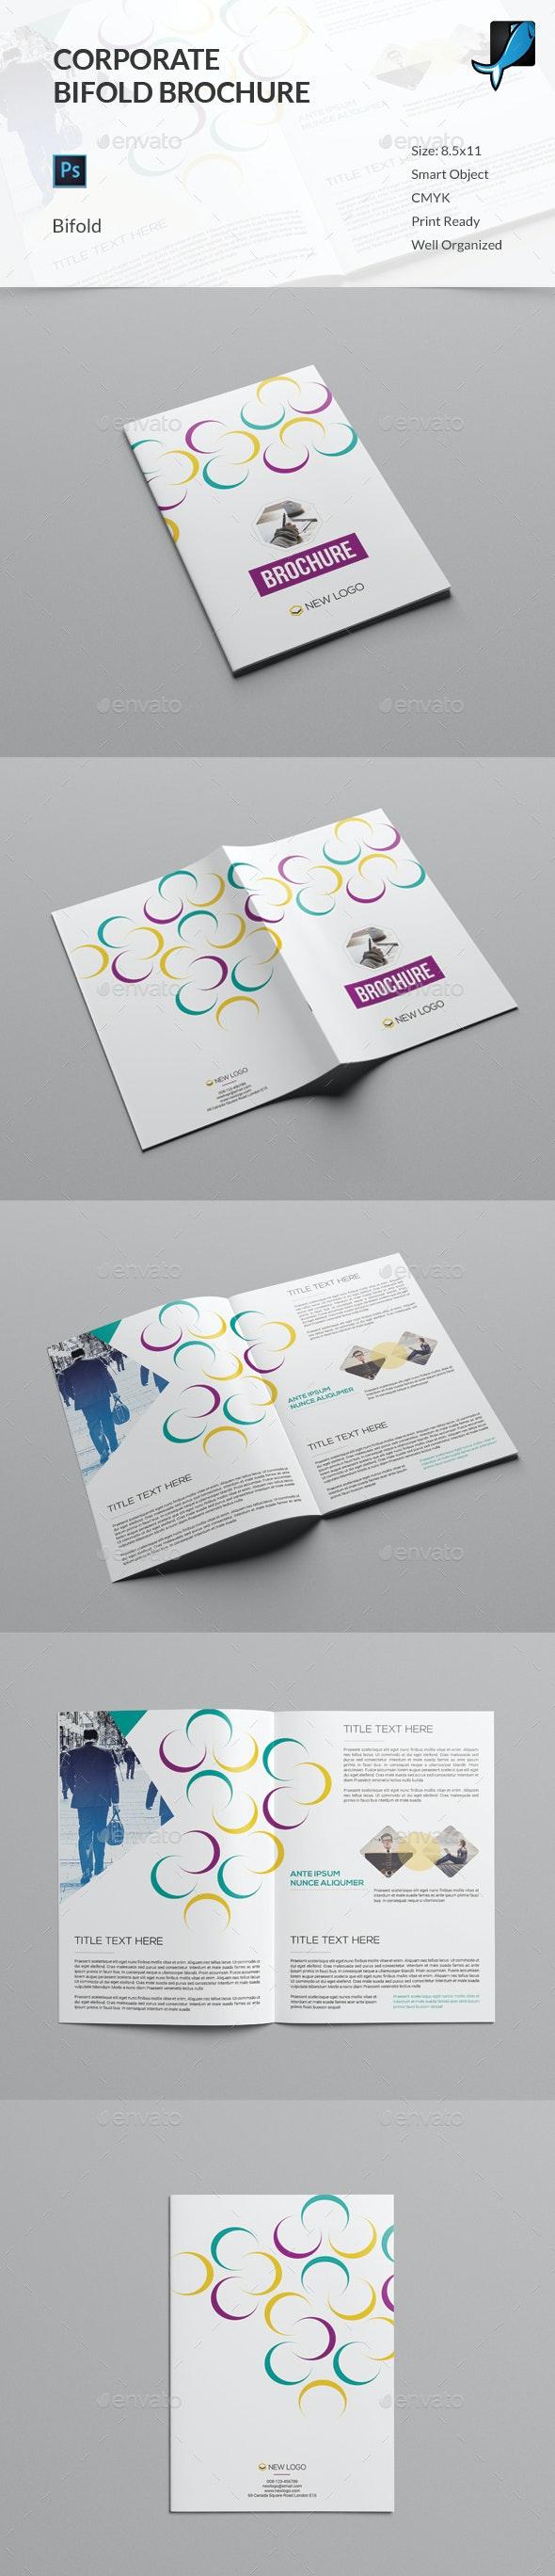 Colorful Corporate Bifold Brochure - Corporate Brochures